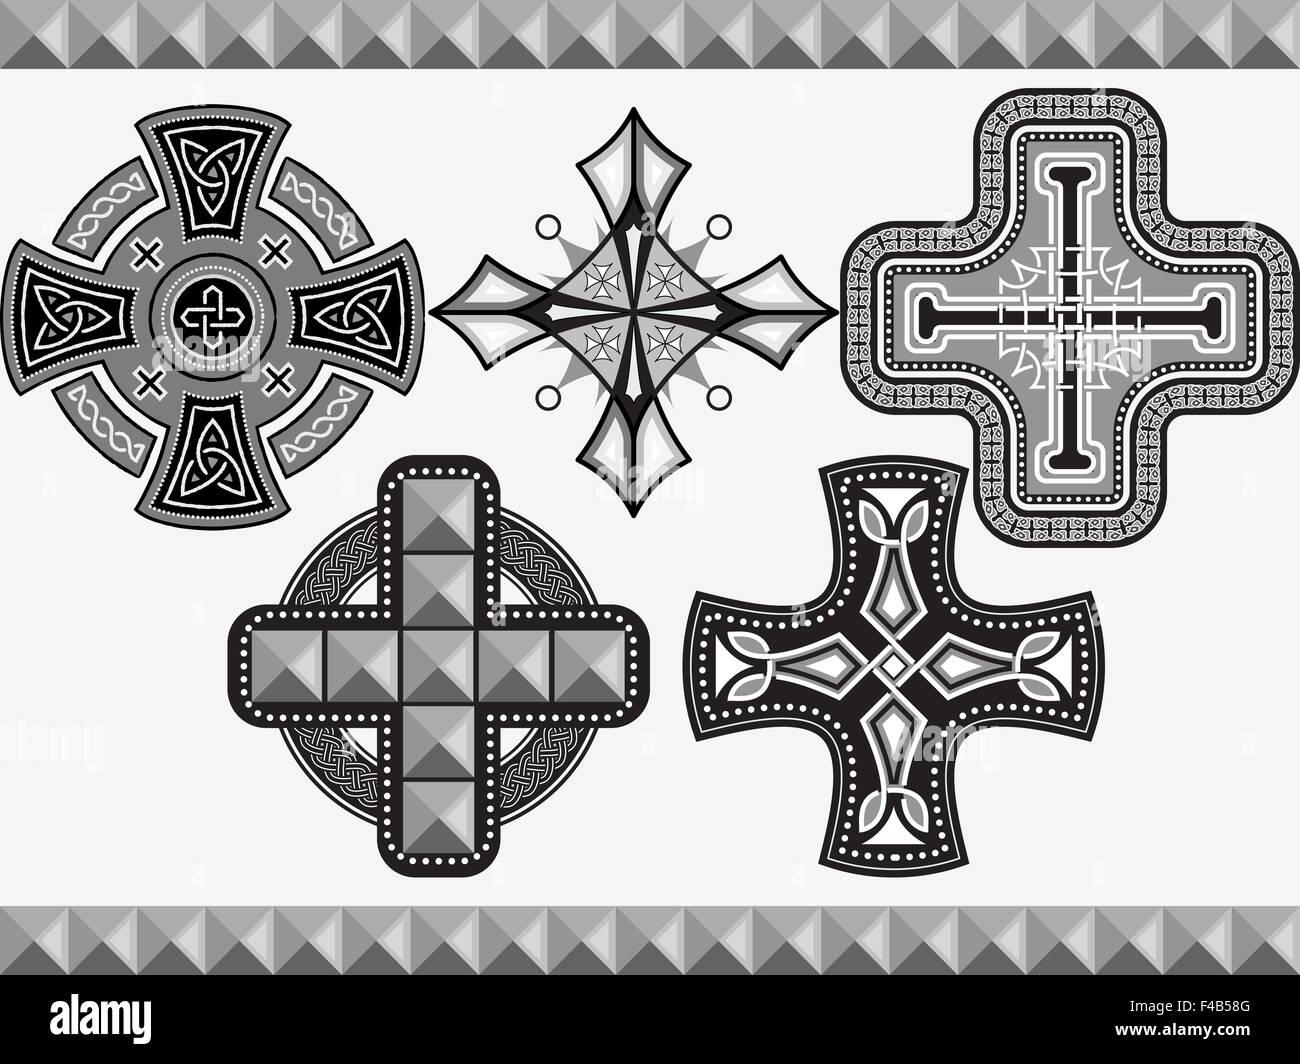 Set celtic crosses - Stock Image